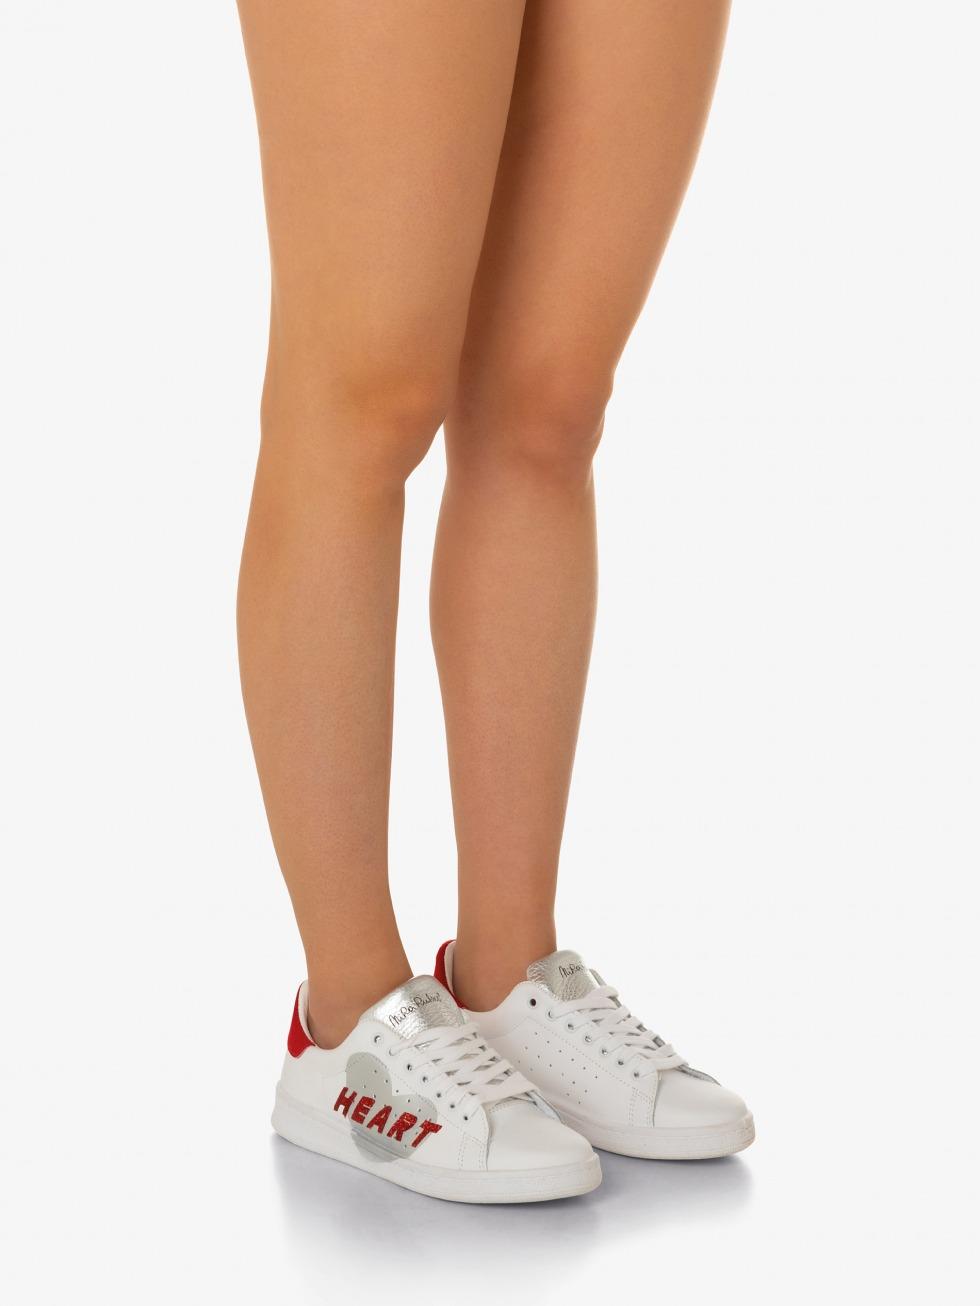 Daiquiri Race Sneakers - Red Heart Race